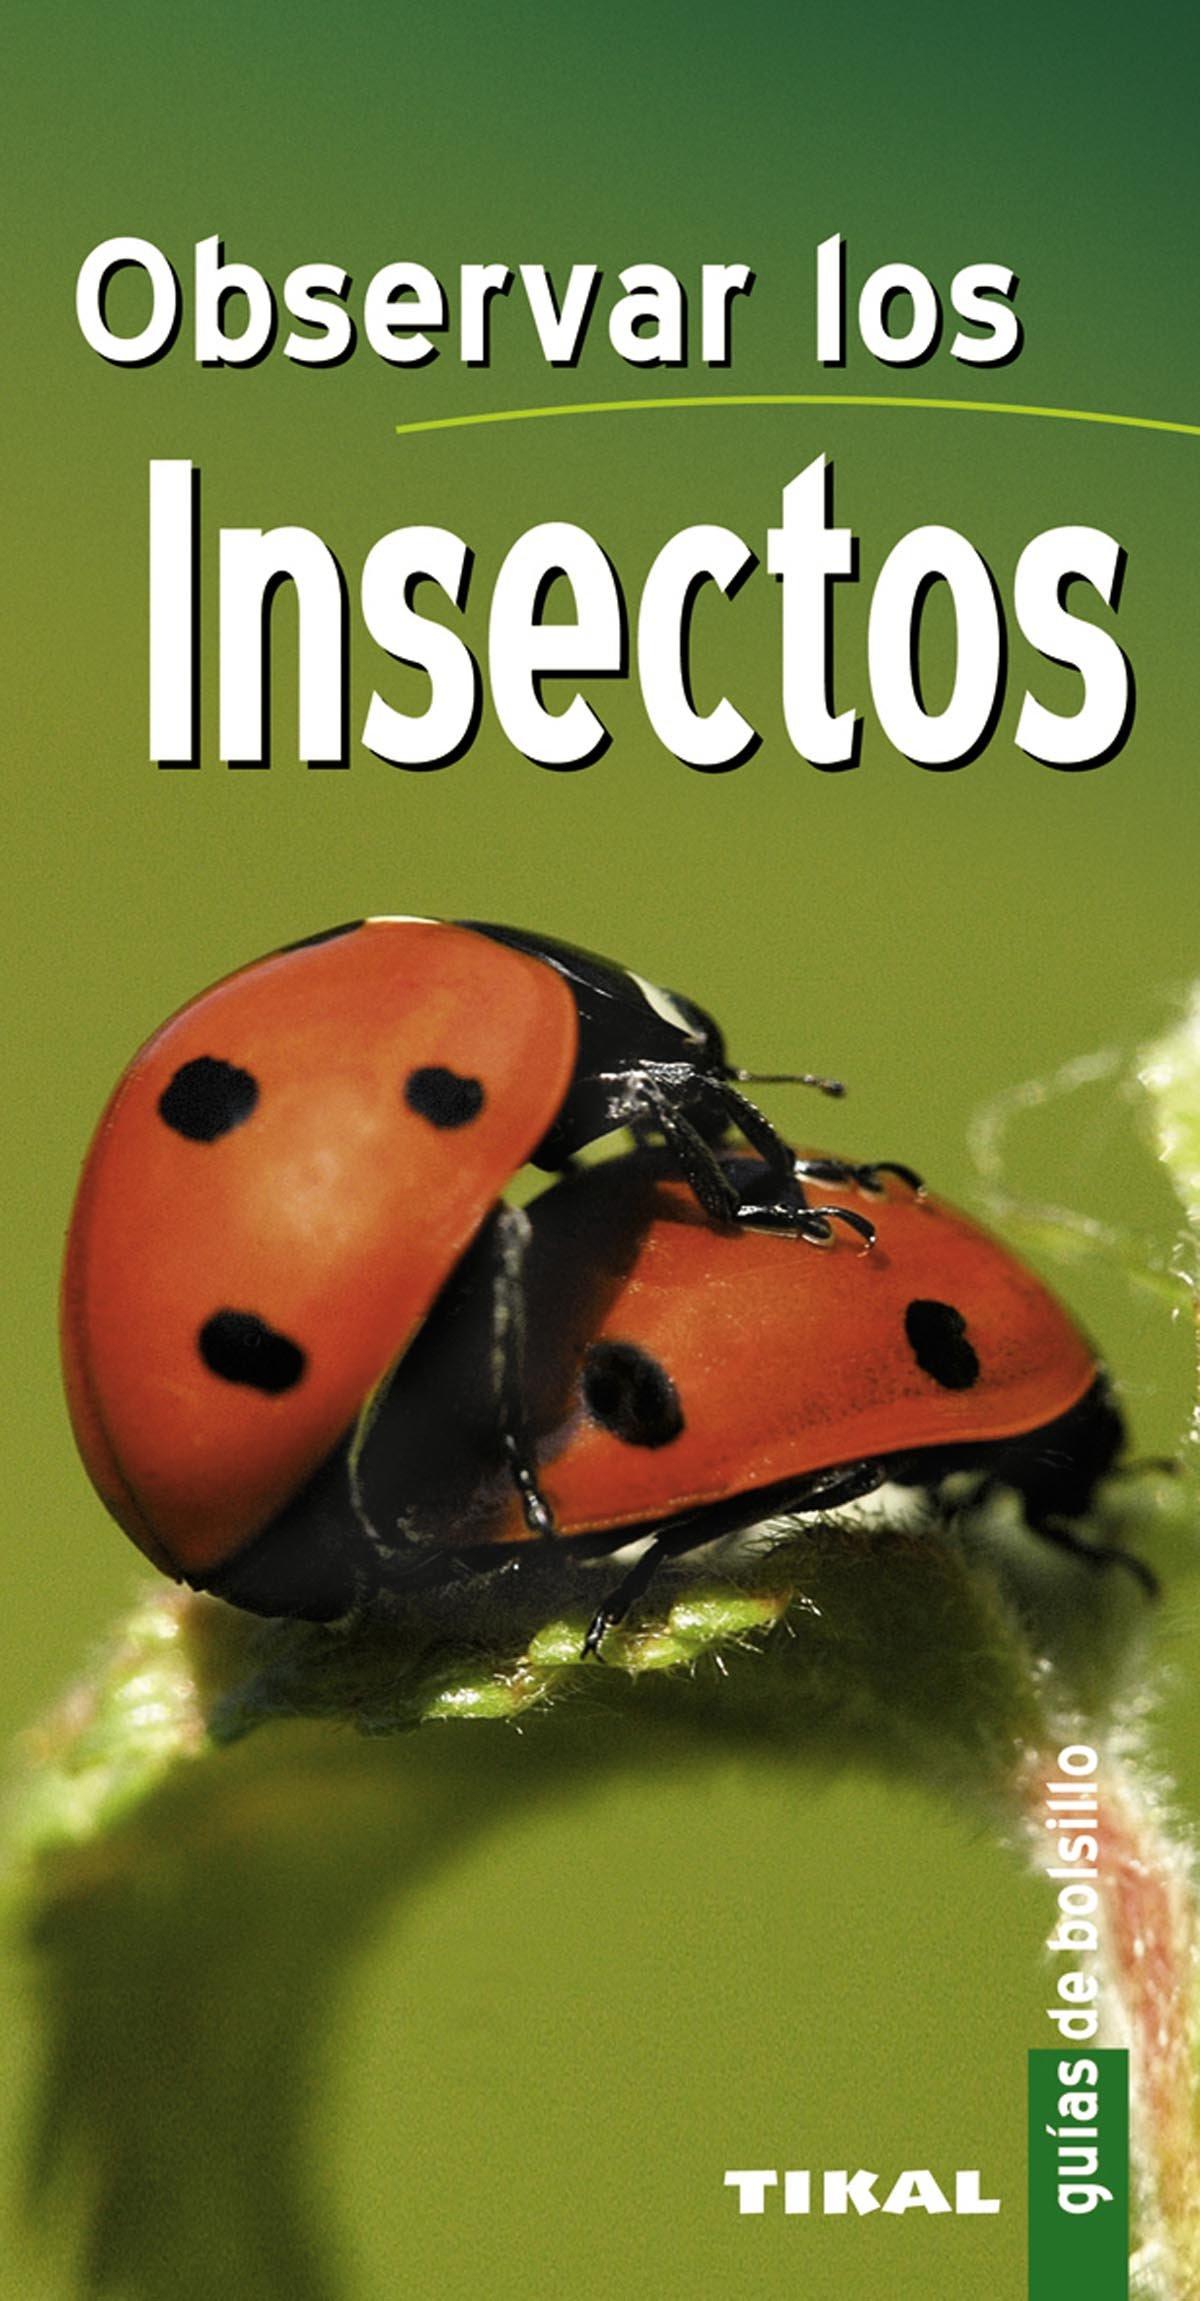 Observar Los Insectos Guias De Bolsillo Guías De Bolsillo: Amazon.es: Bignon, Jean-Jacques: Libros